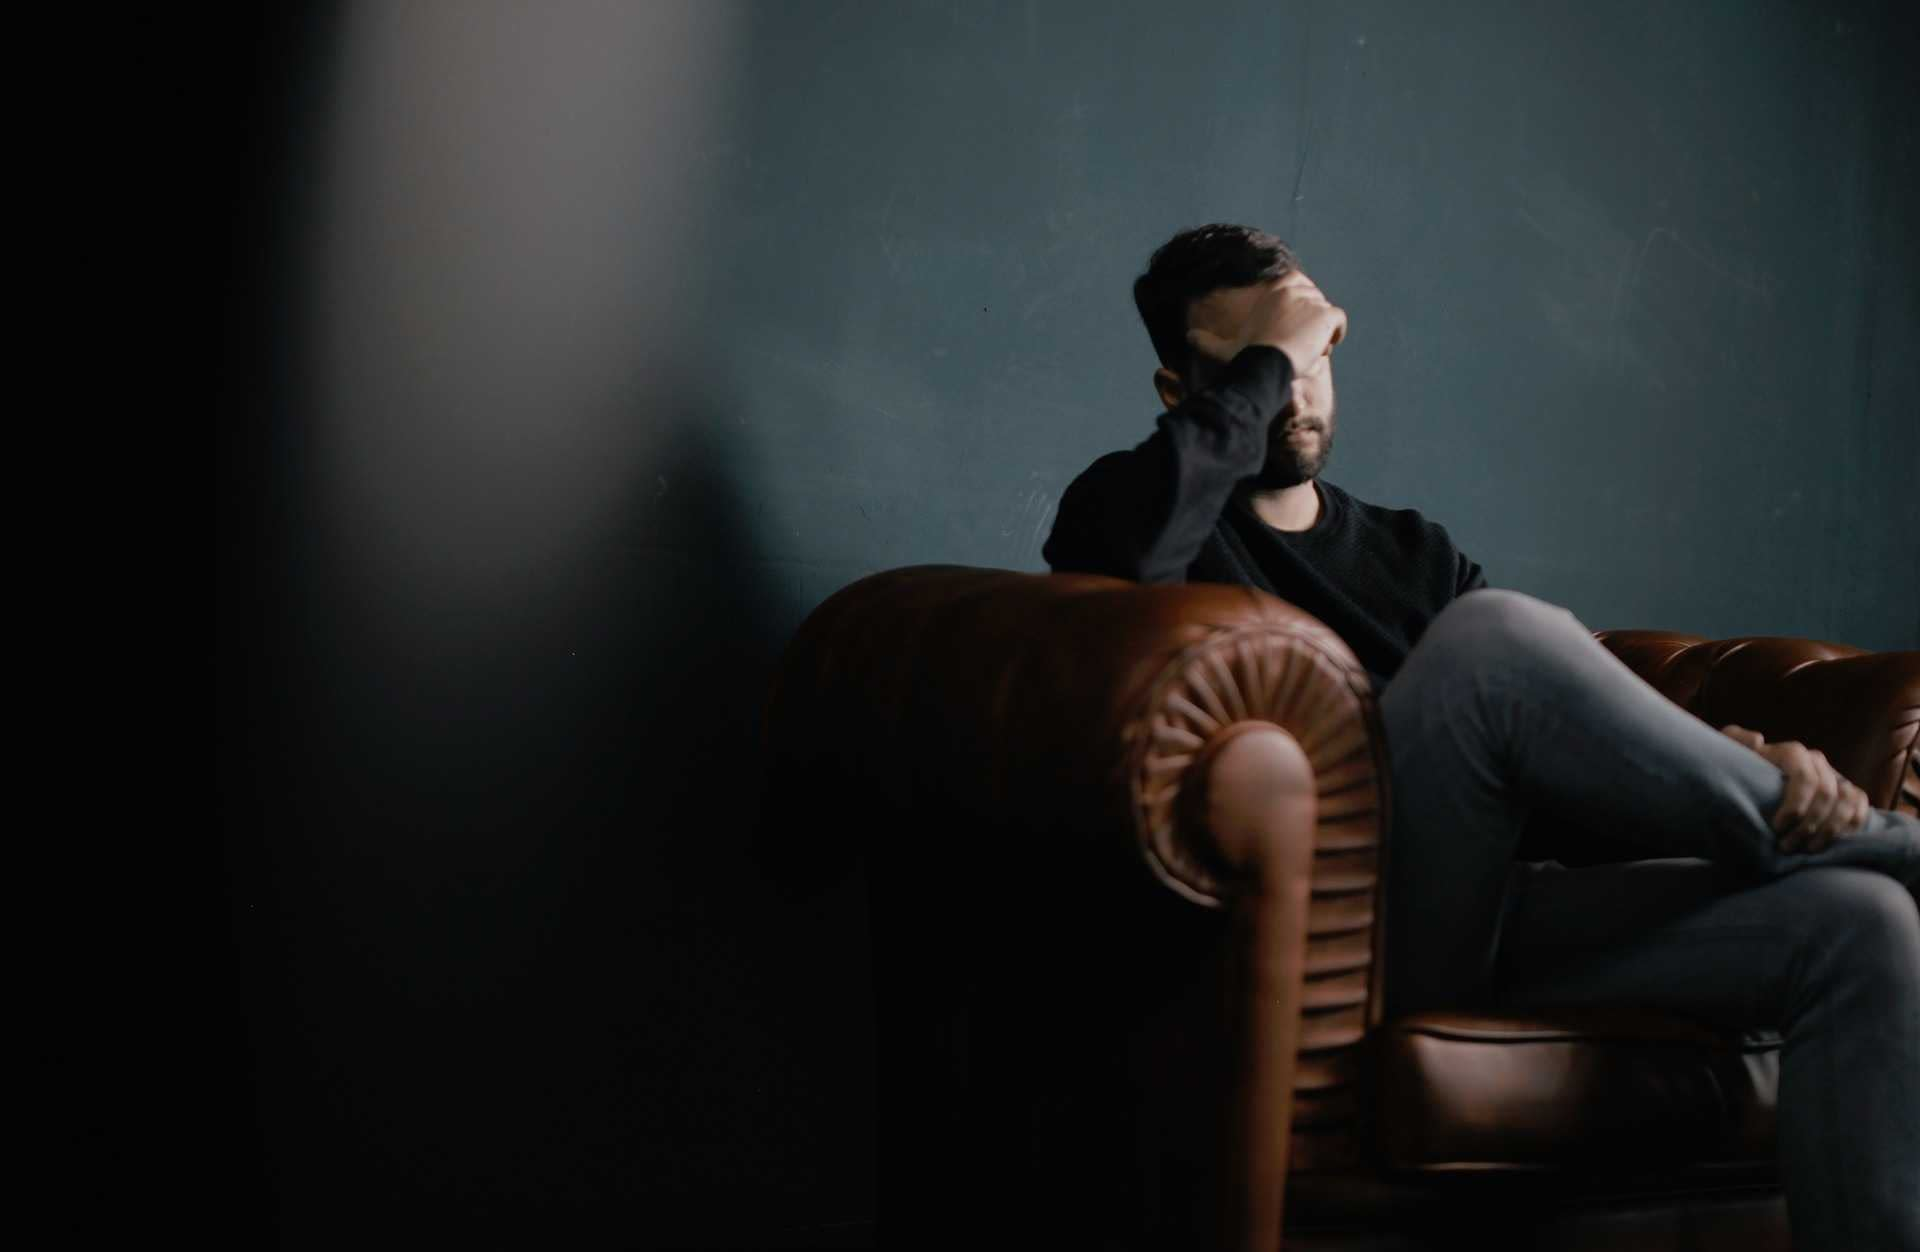 VA Disability Benefits for Migraines